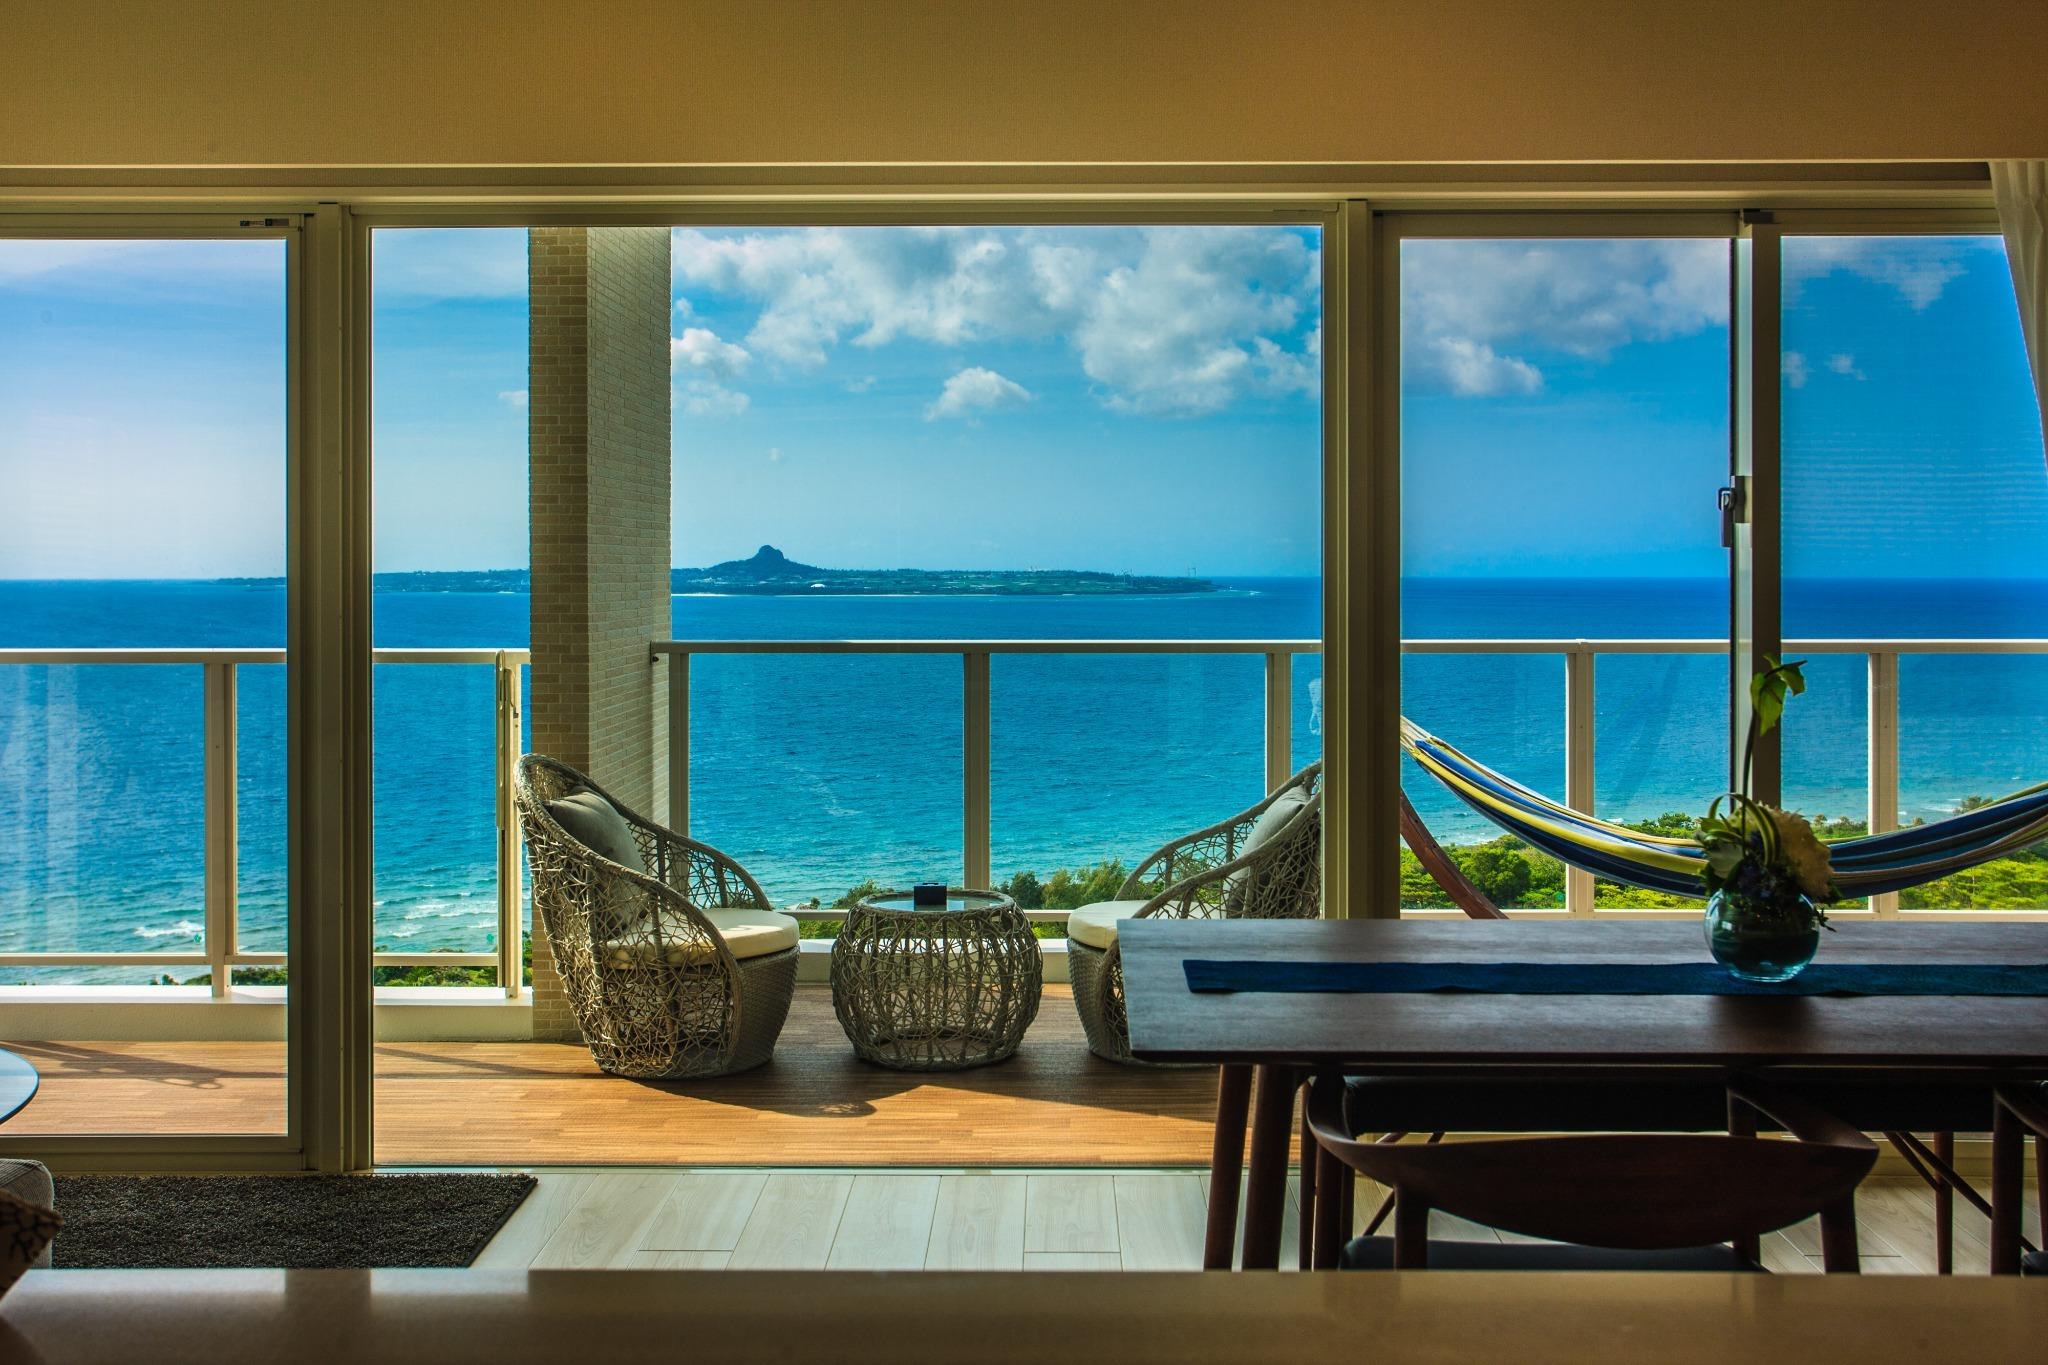 Ocean view / オーシャンビュー